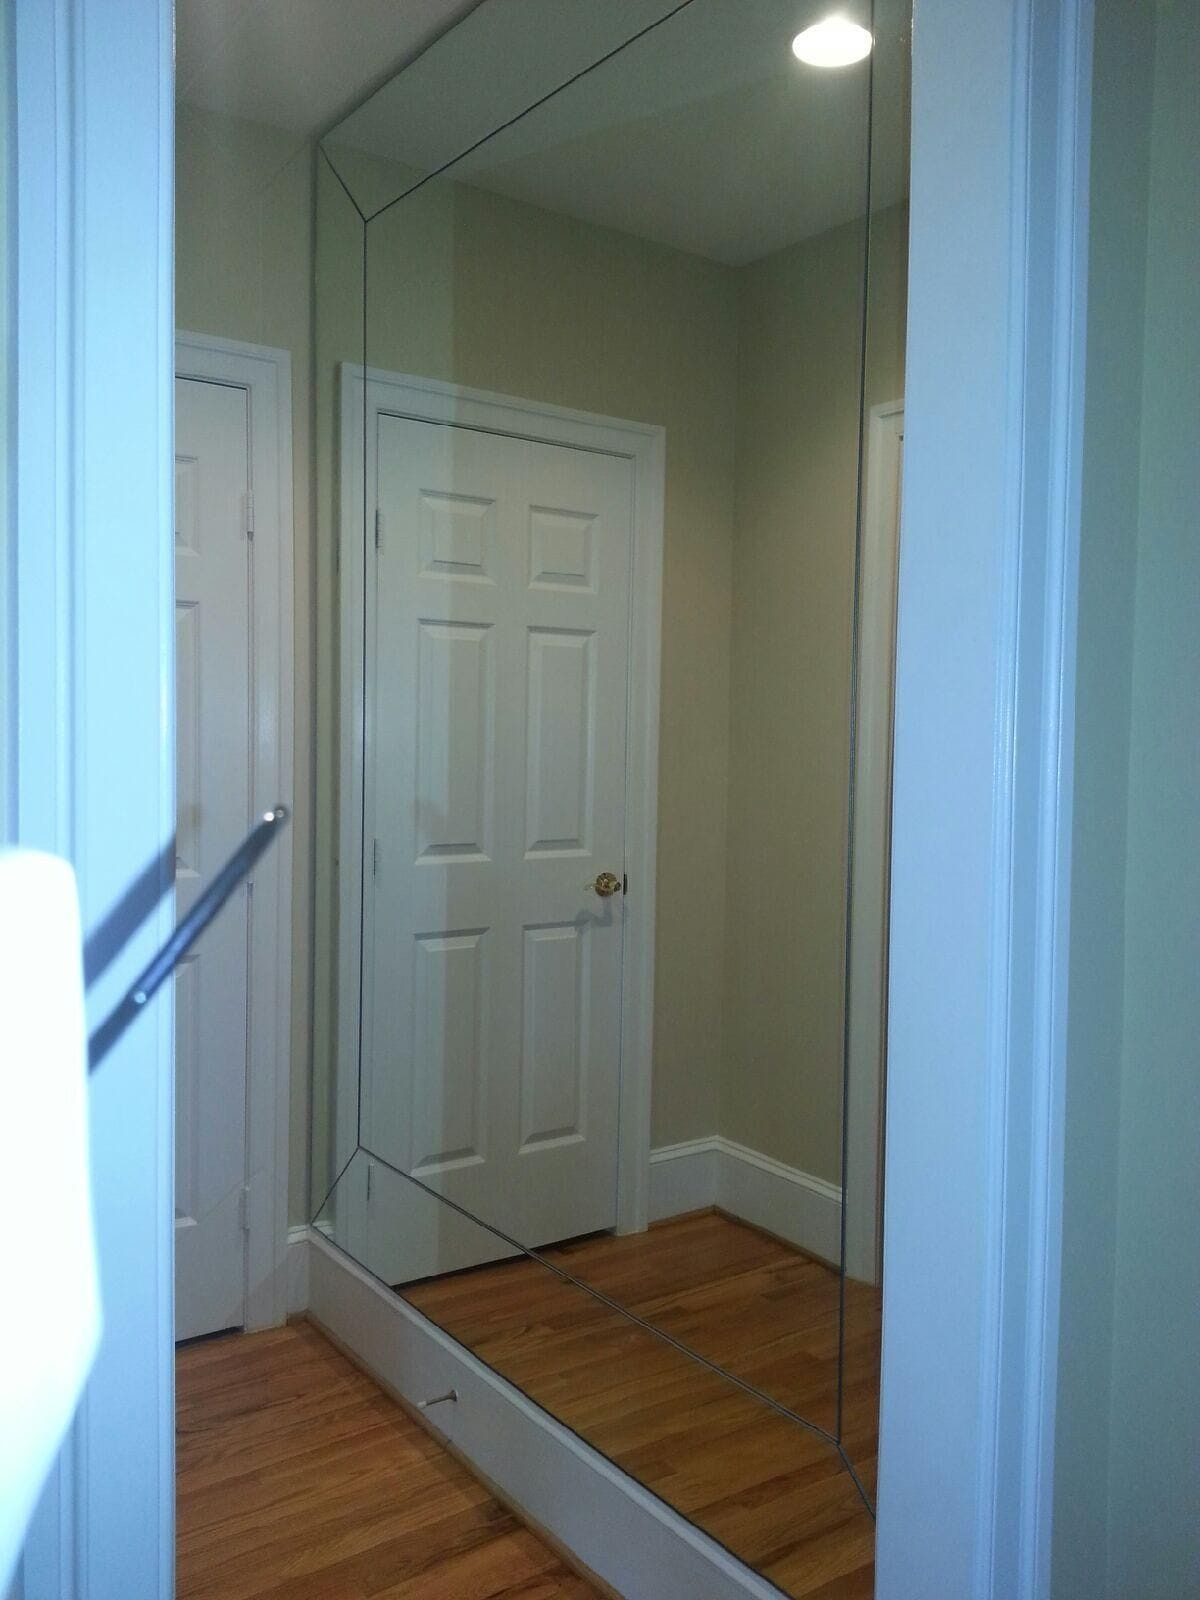 Hallway Mirror 5.15.13-min